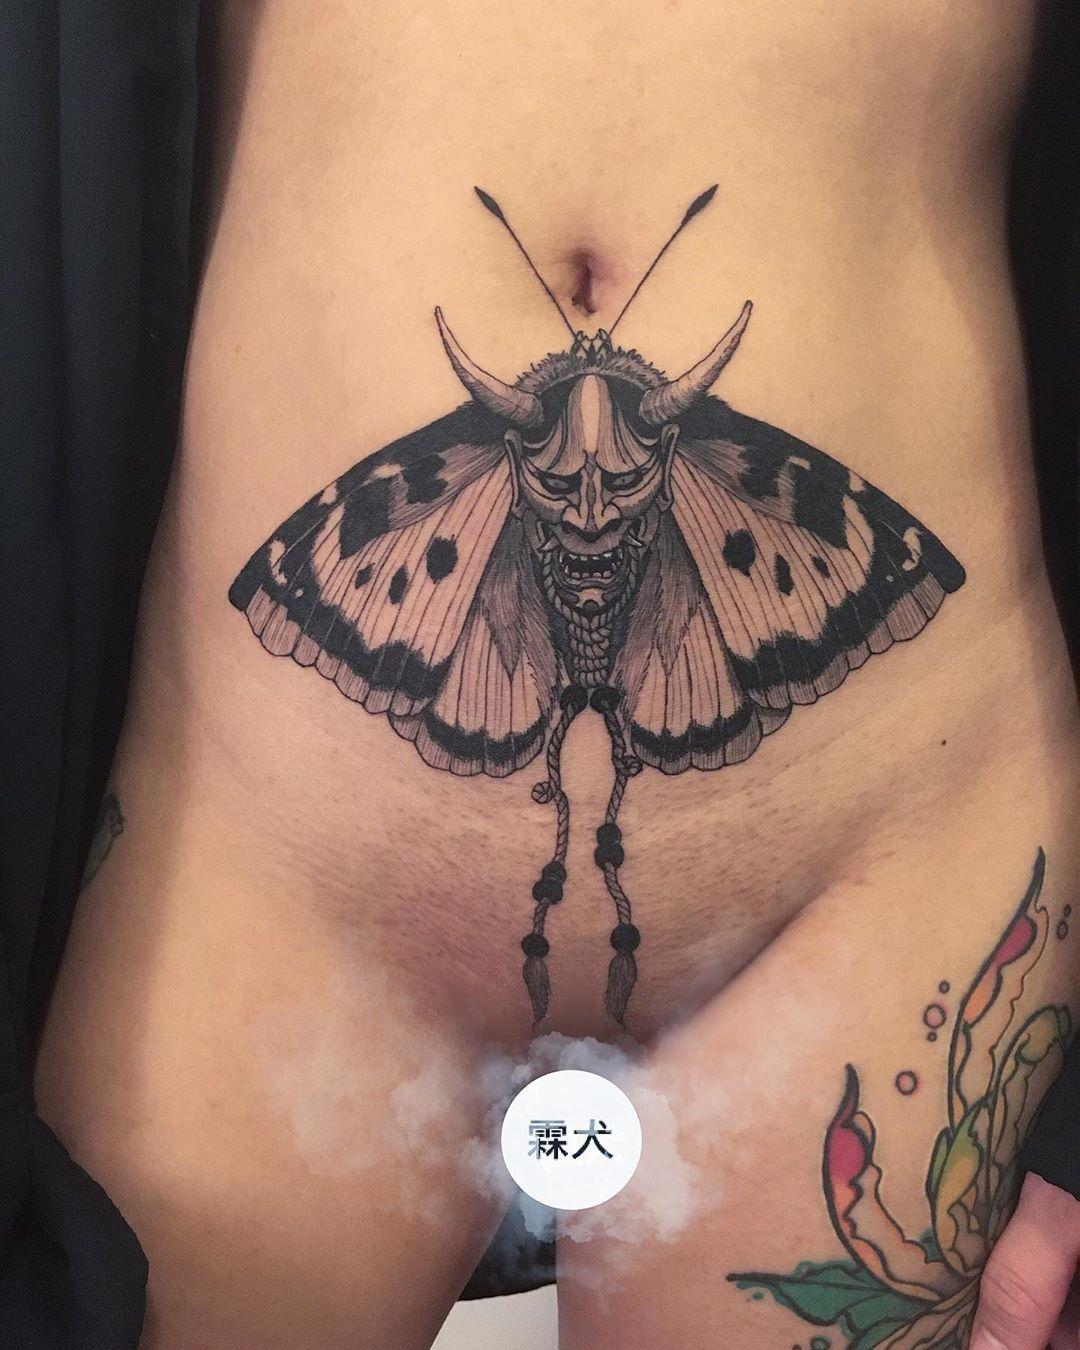 Illustrative Black and Grey Tattoo Toronto